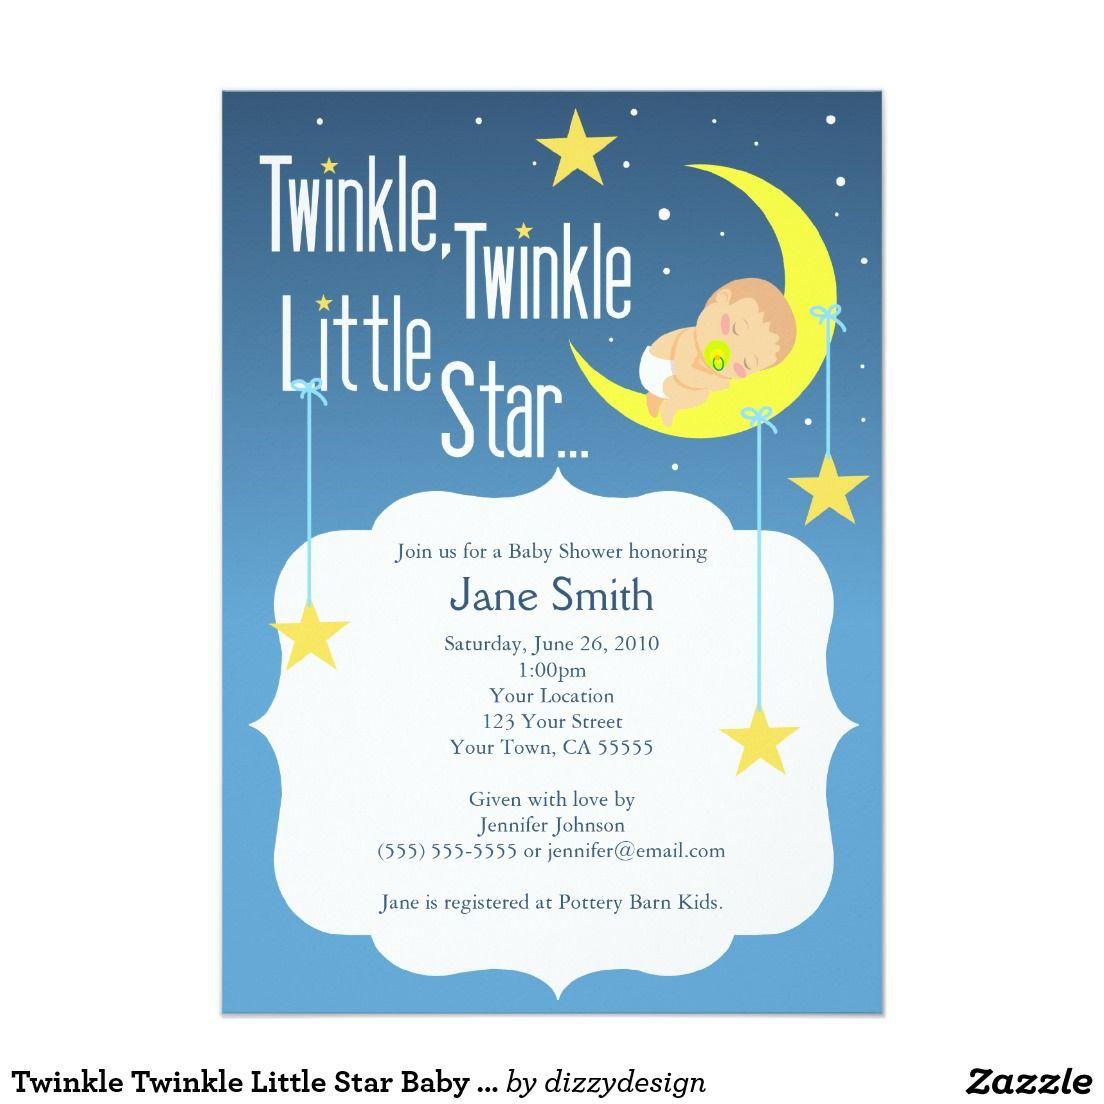 Twinkle Twinkle Little Star Baby Shower Invite | baby shower ...